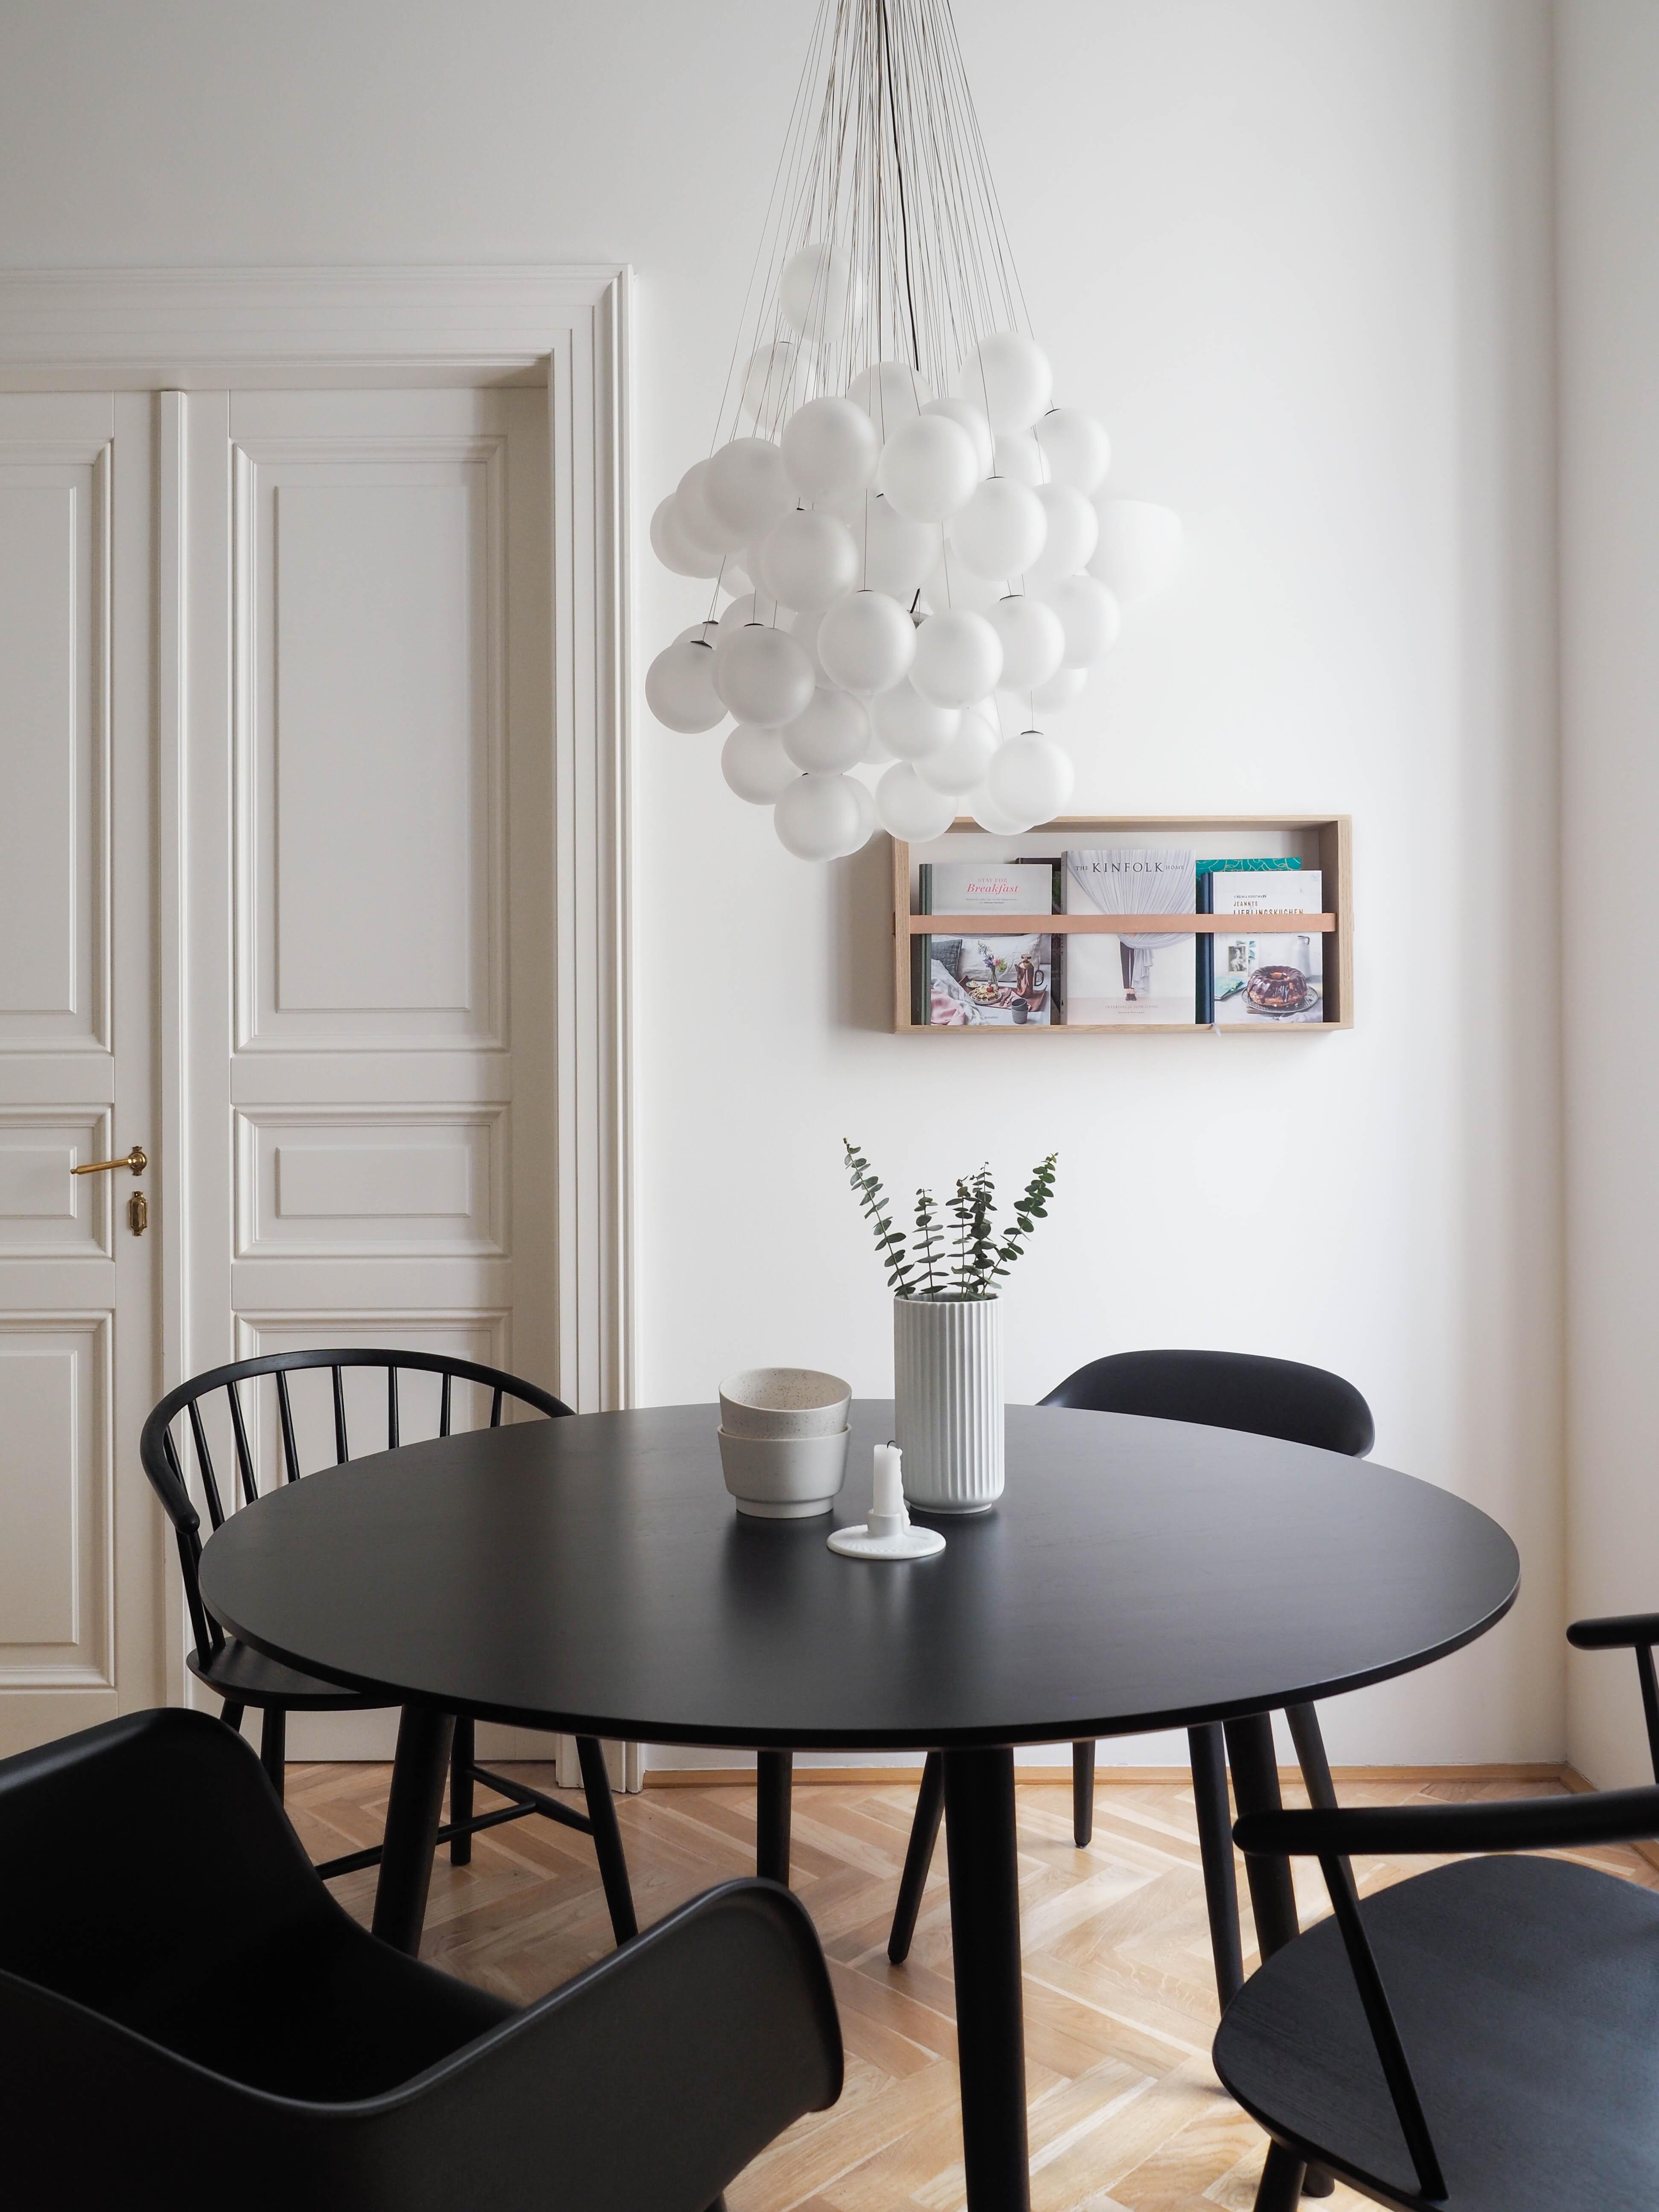 Altbauküche Fredericia J64 Chair